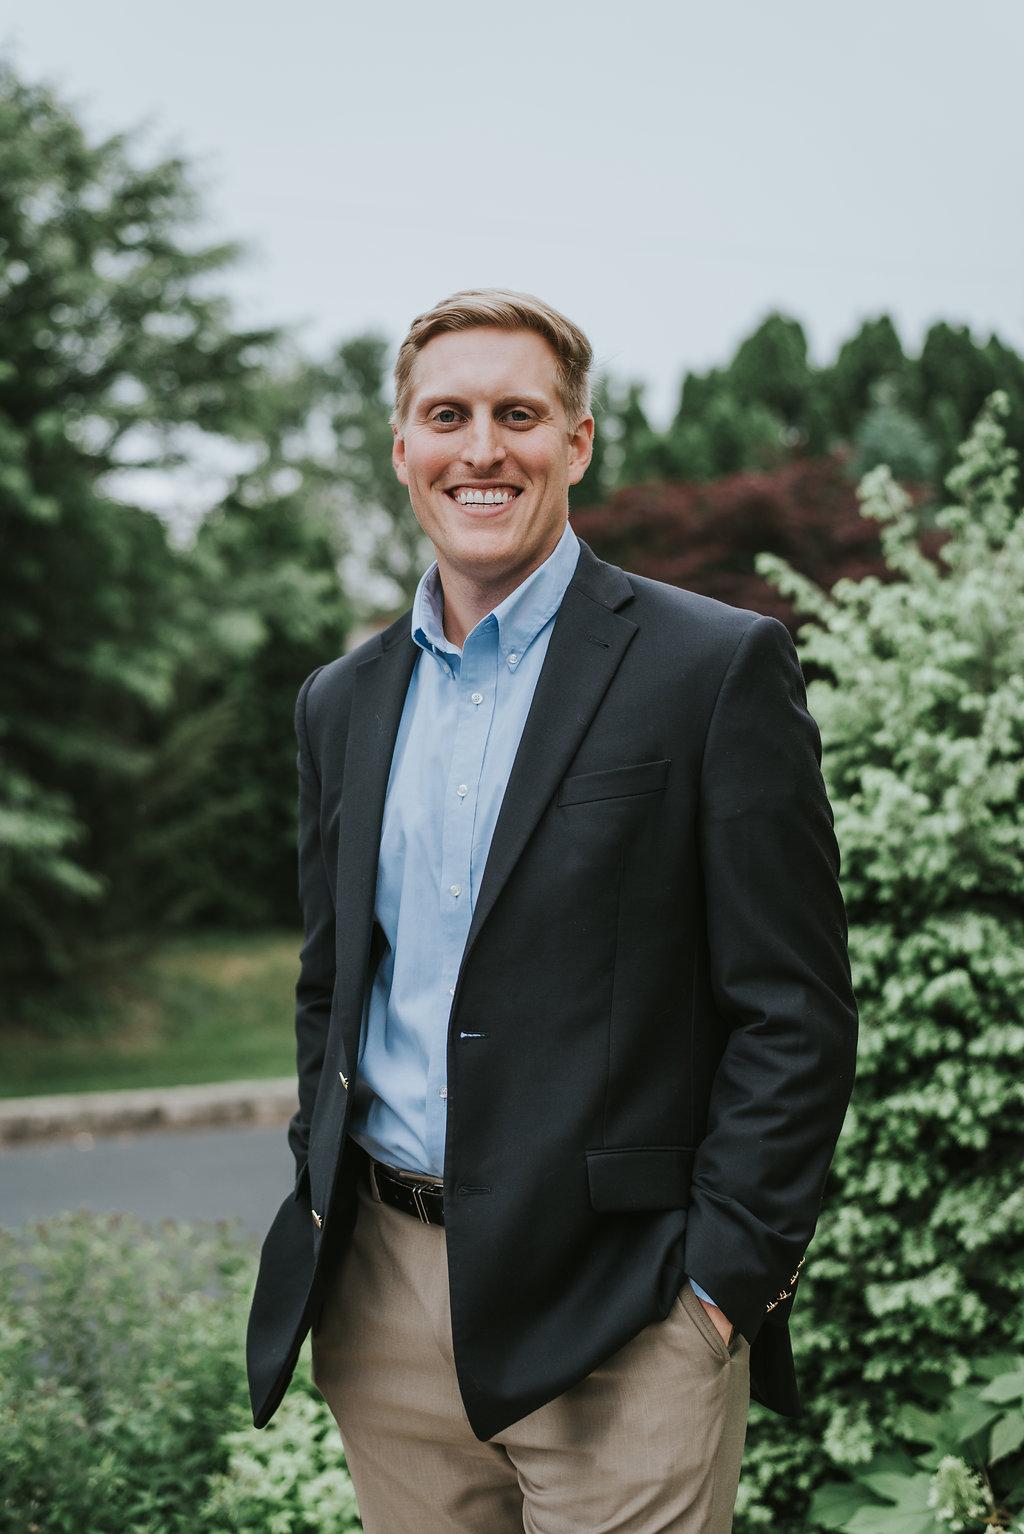 Derek G. Mosley, CFP®'s profile image